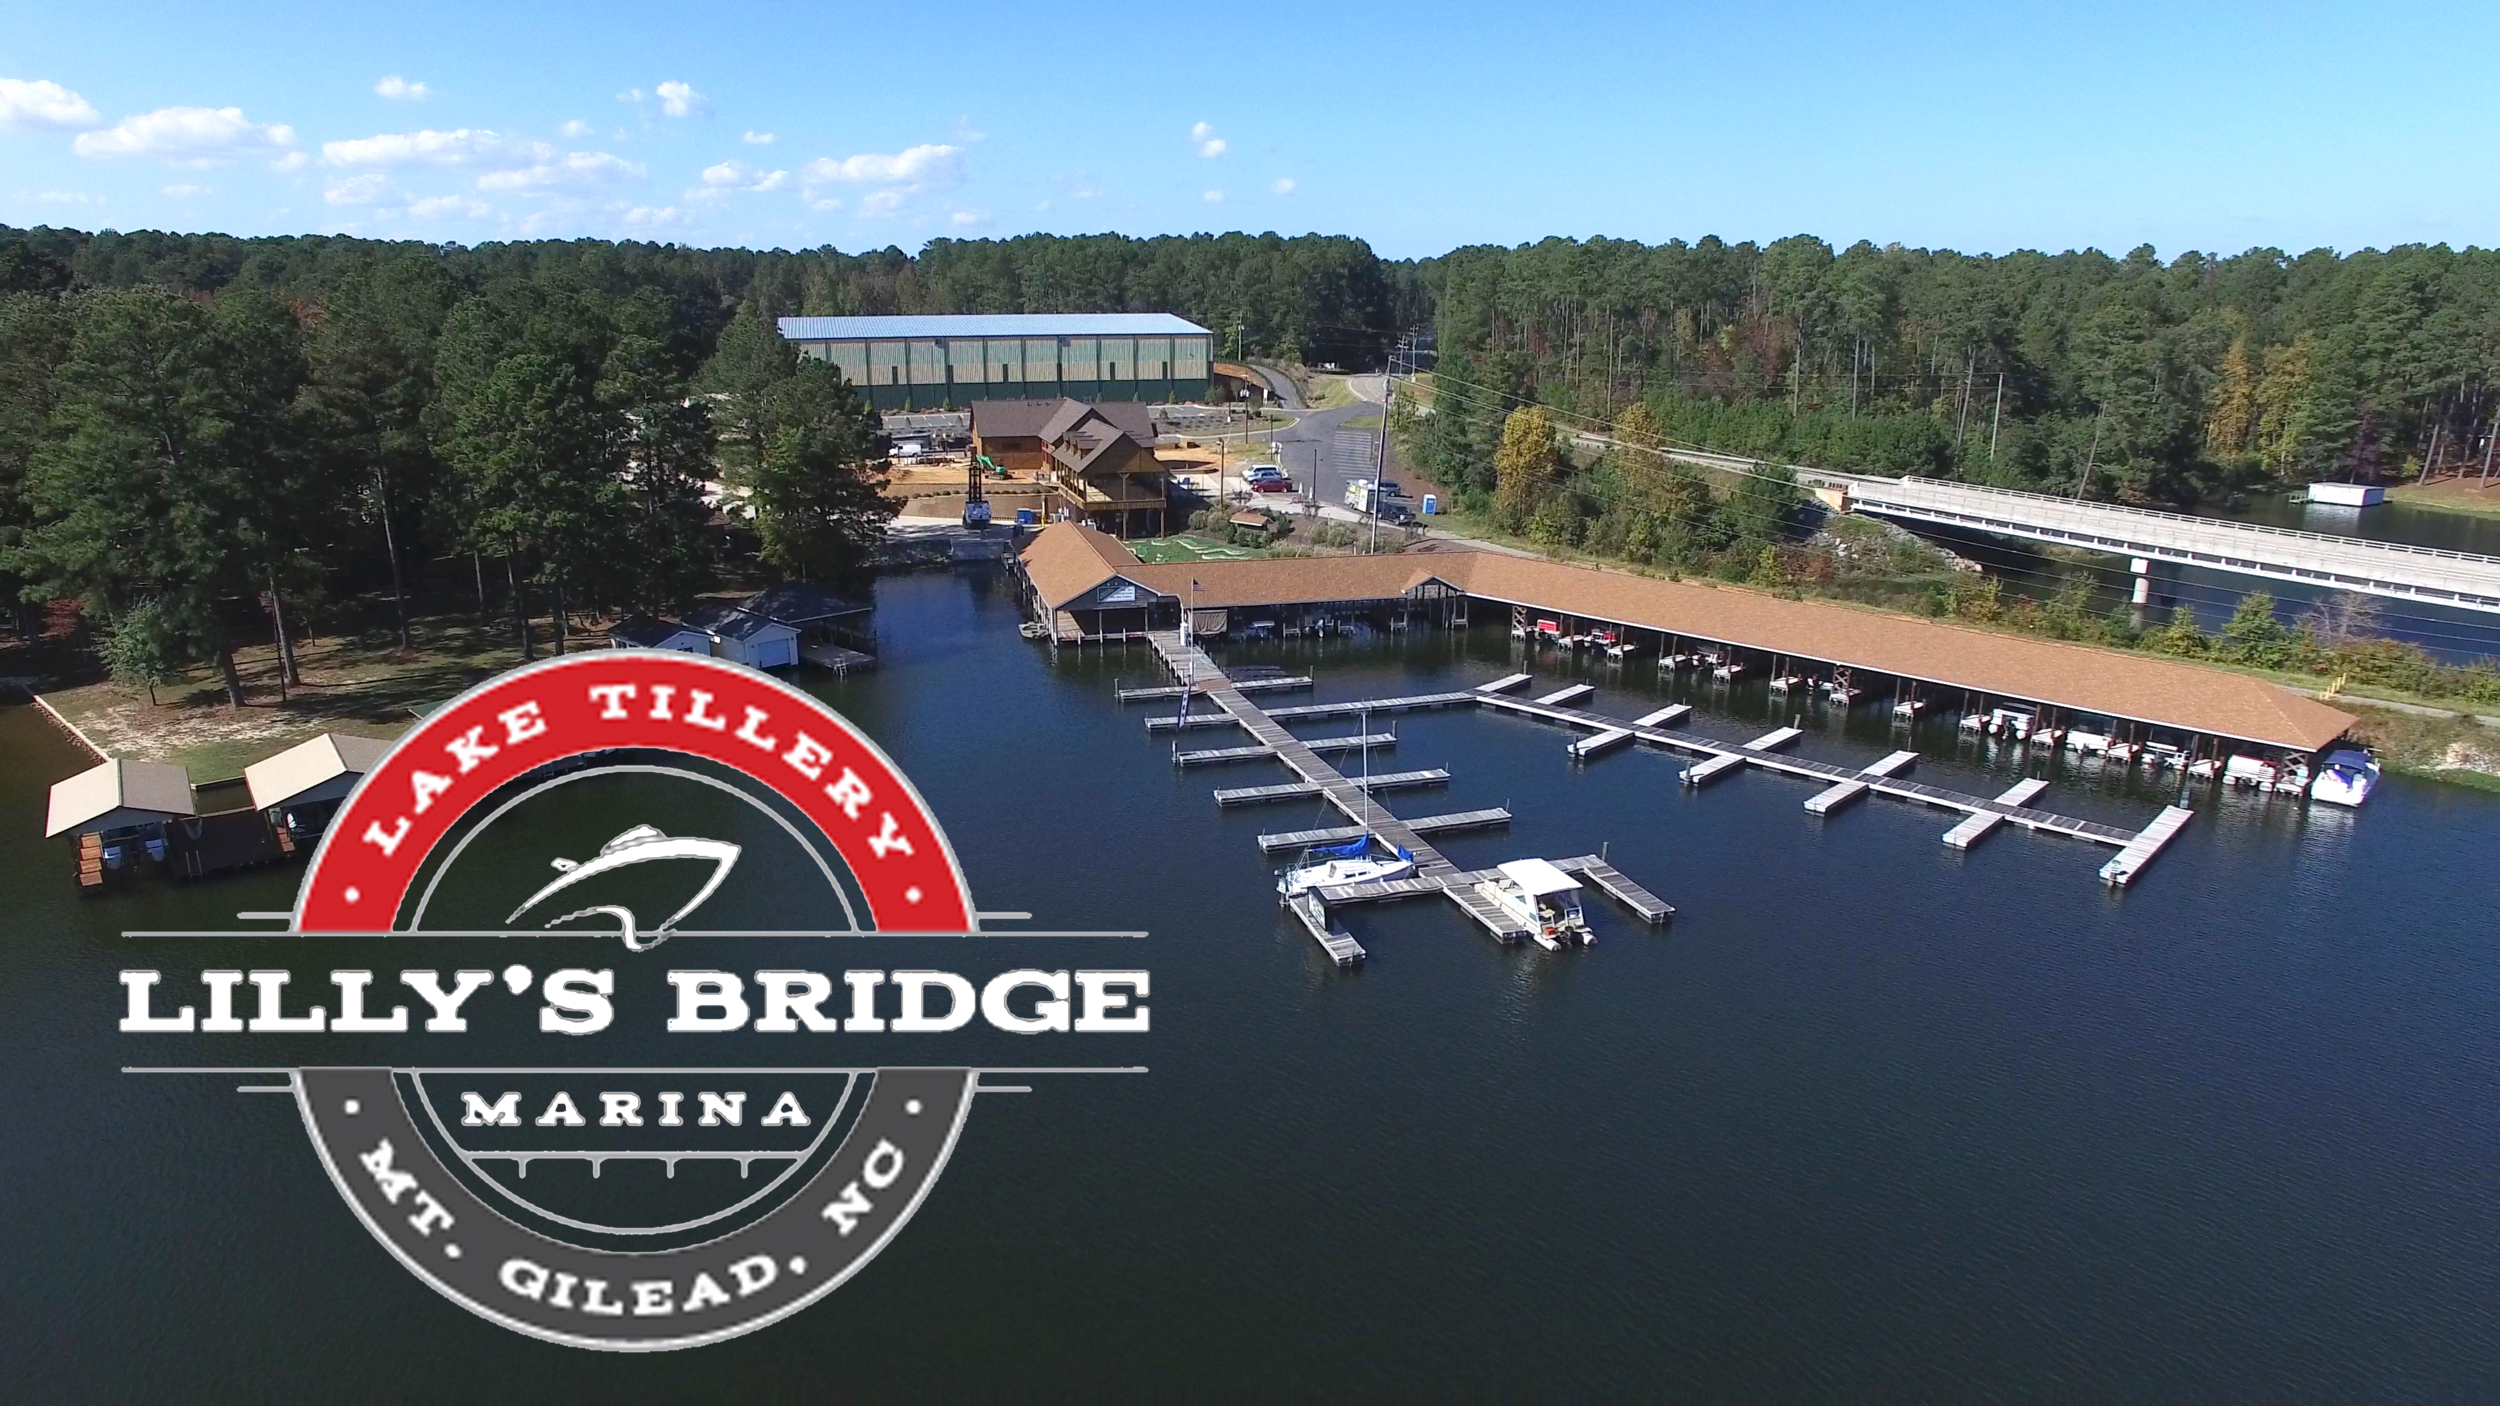 Lake-Tillery-boat-rental-kayak-slips-dry-storage-1.jpg